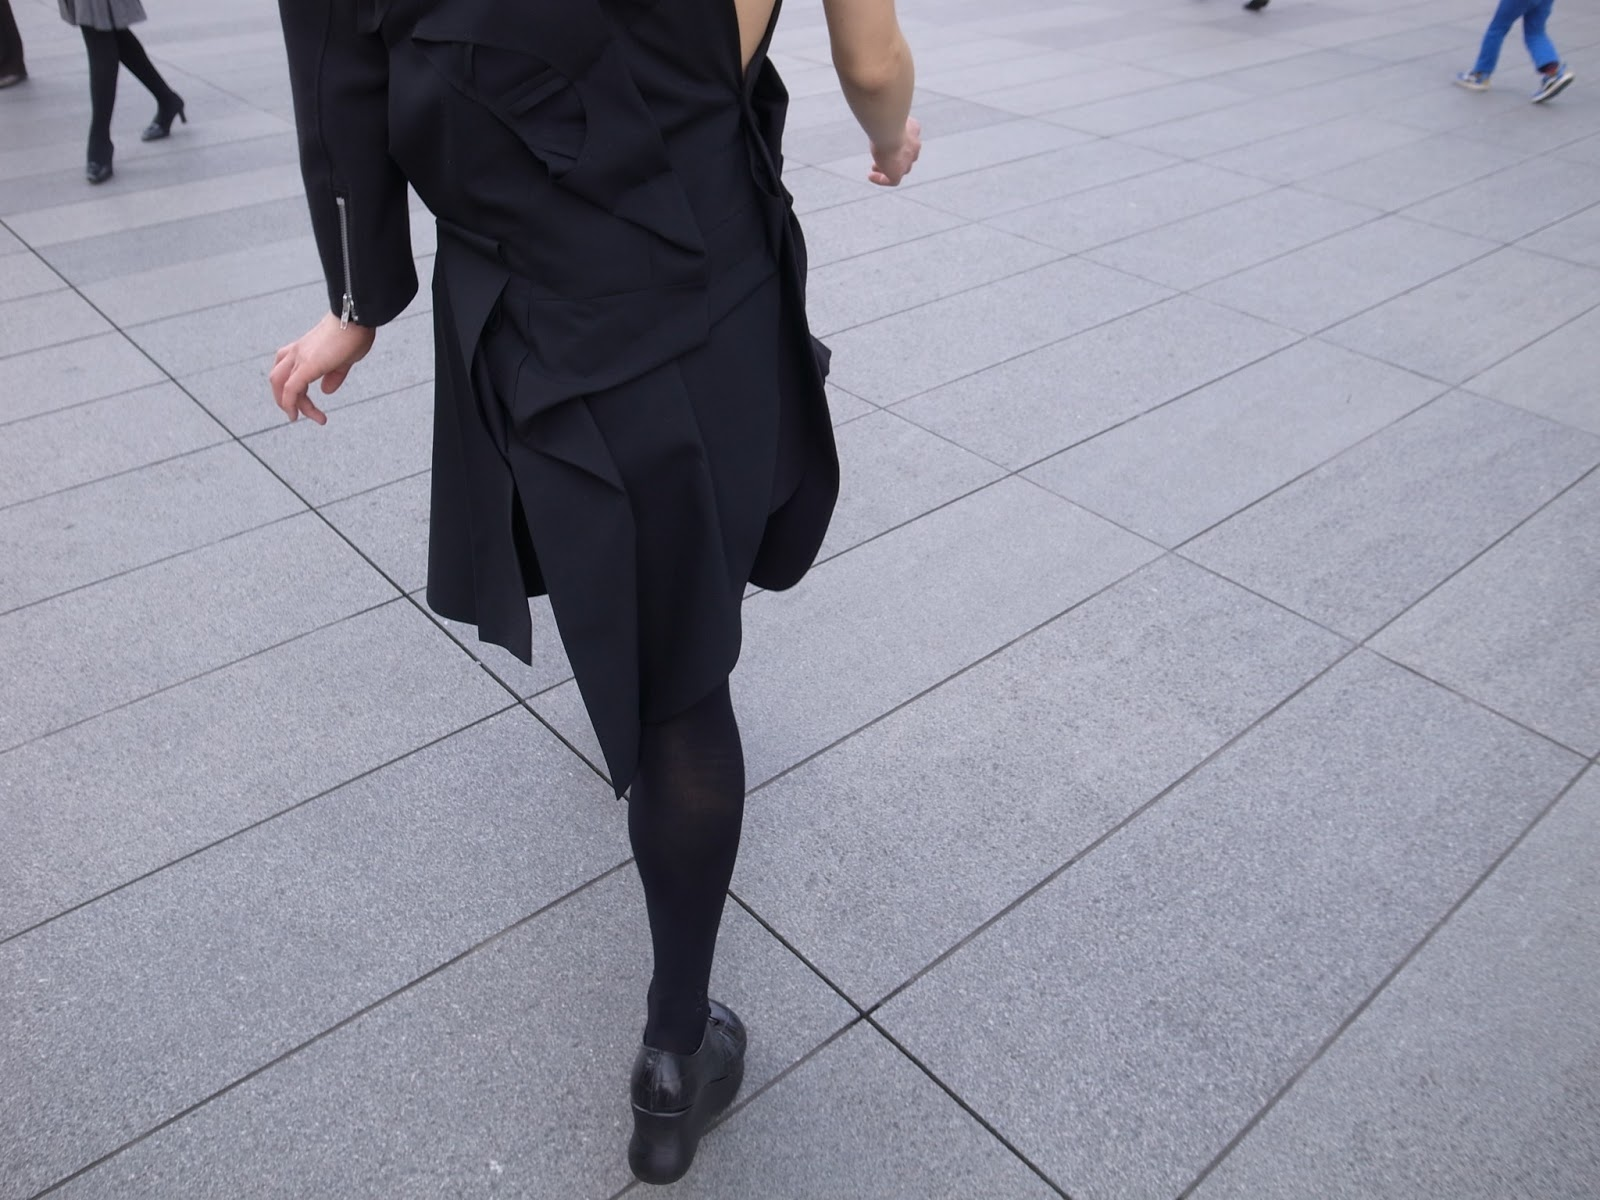 Jacket : COMME des GARÇONS (2013 SS) Pants : Junya Watanabe COMME des GARÇONS Shoes : COMME des GARÇONS (2013 SS)